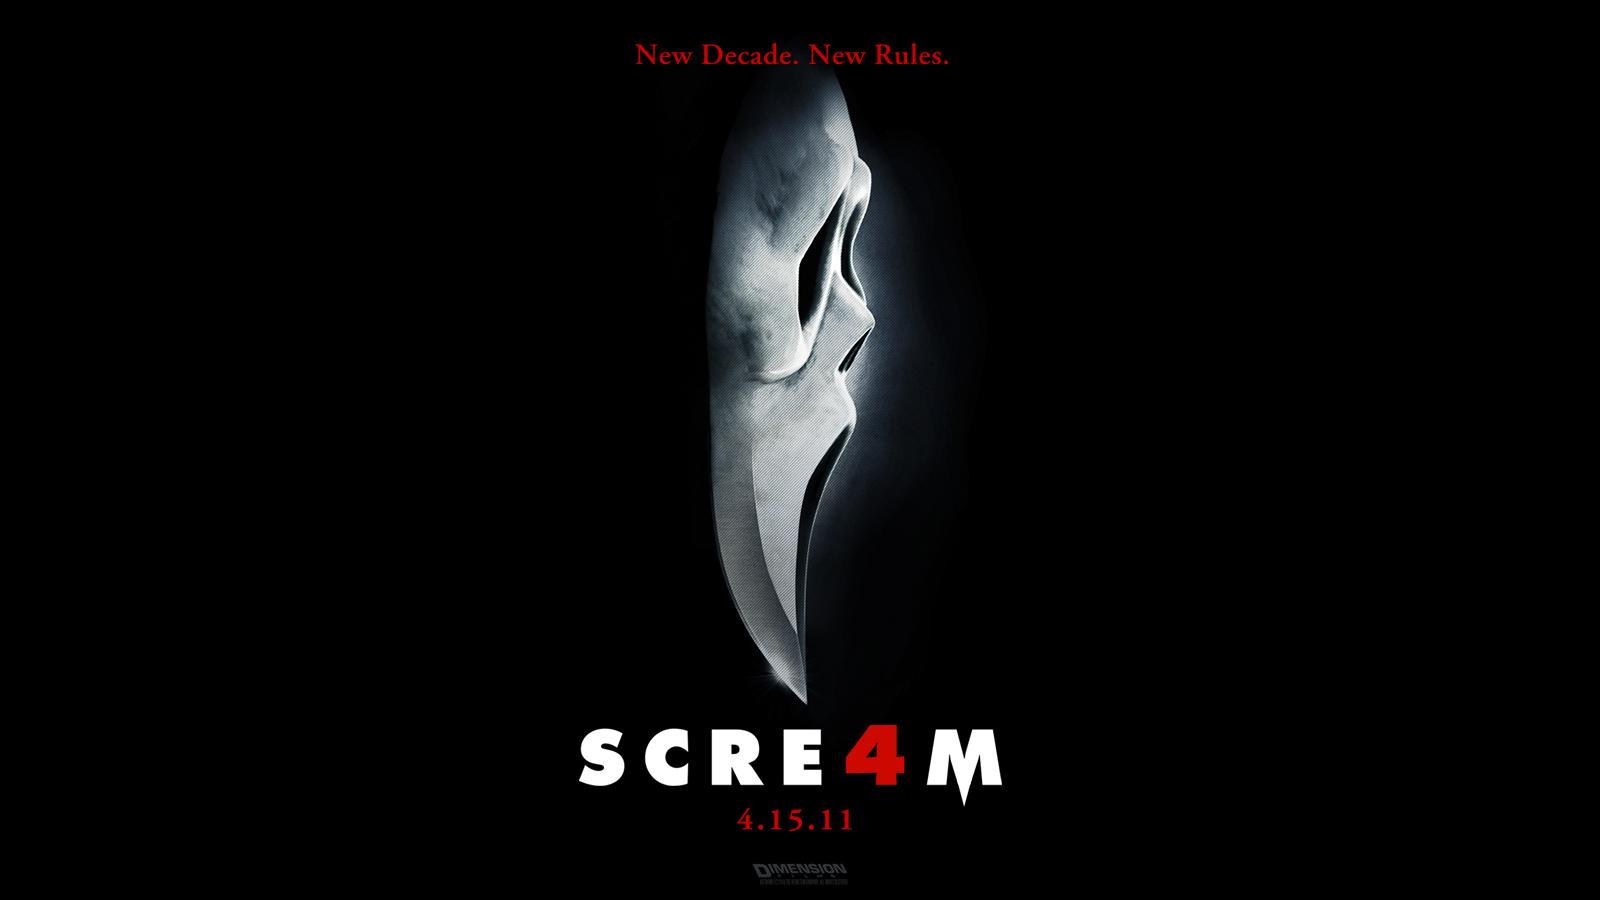 http://3.bp.blogspot.com/-Ko2R11Eo7OQ/TaalA_WdvMI/AAAAAAAANiQ/eBsMejmuUlw/s1600/Scream+4+-+1.jpg